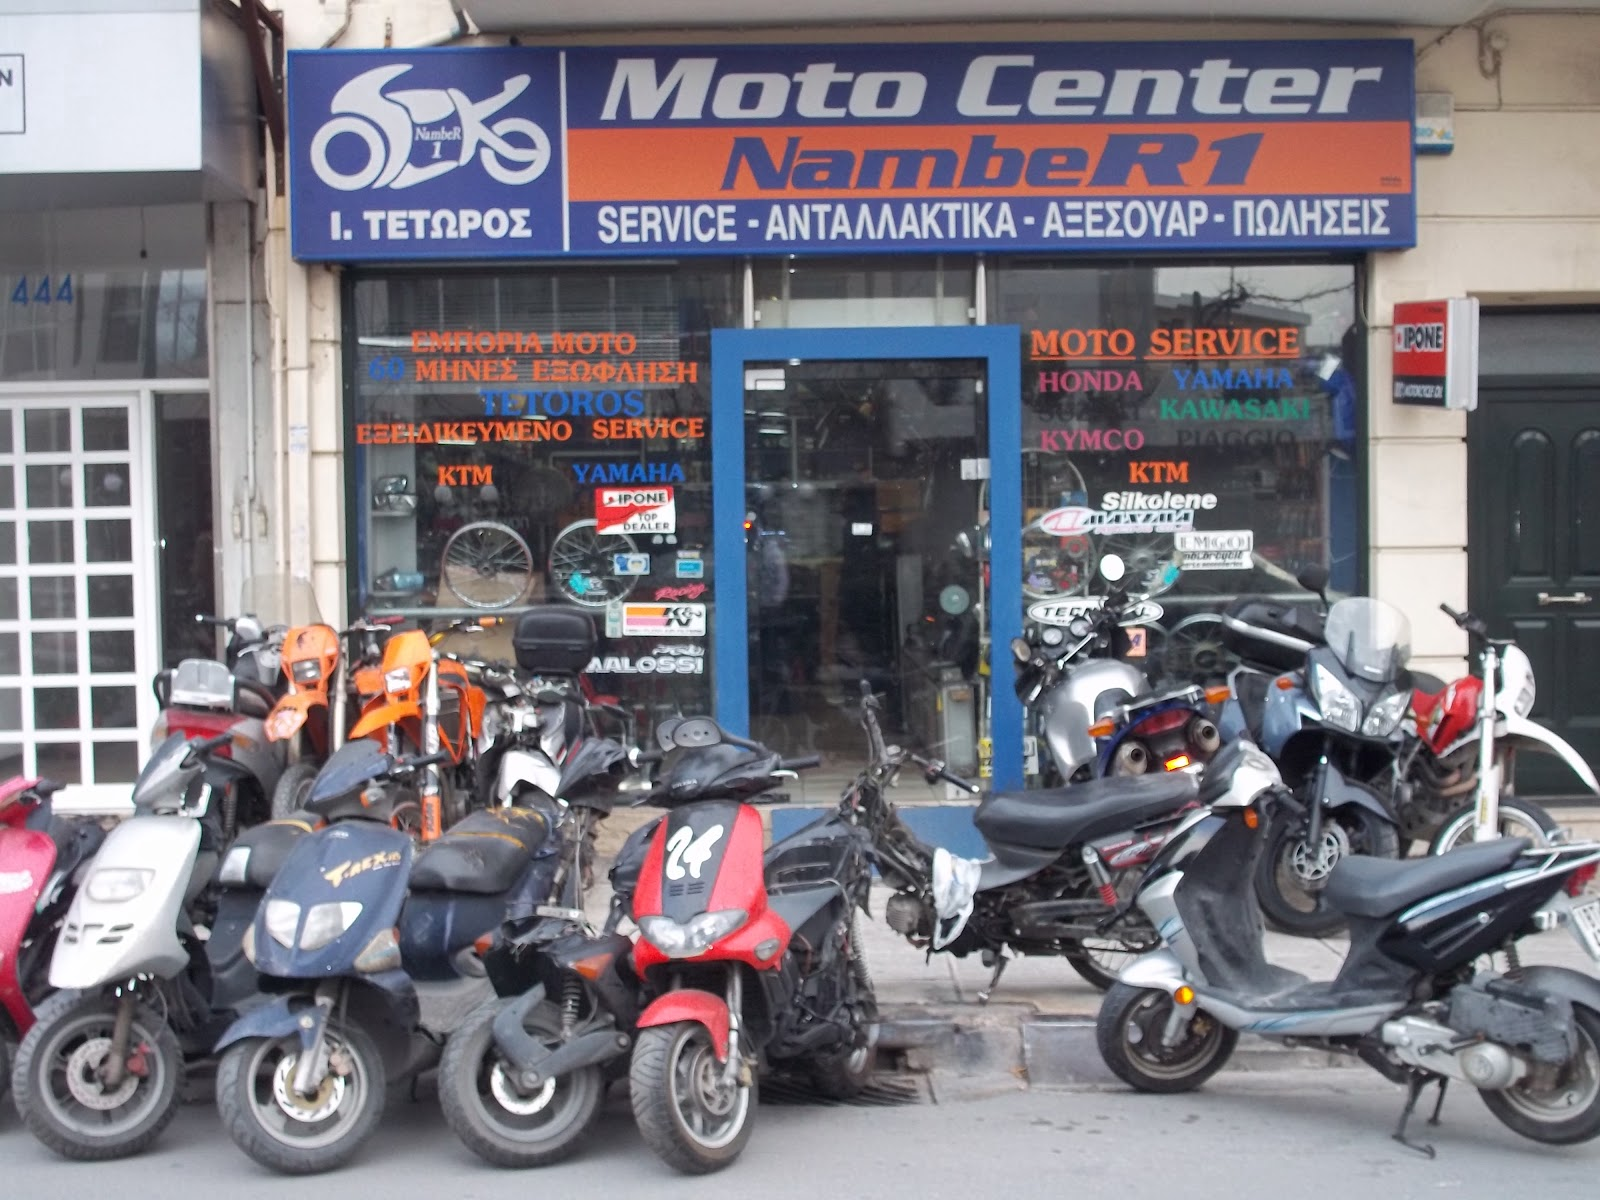 moto center number 1(Συνεργείο μοτοσικλετών Ιωάννης Τετώρος)